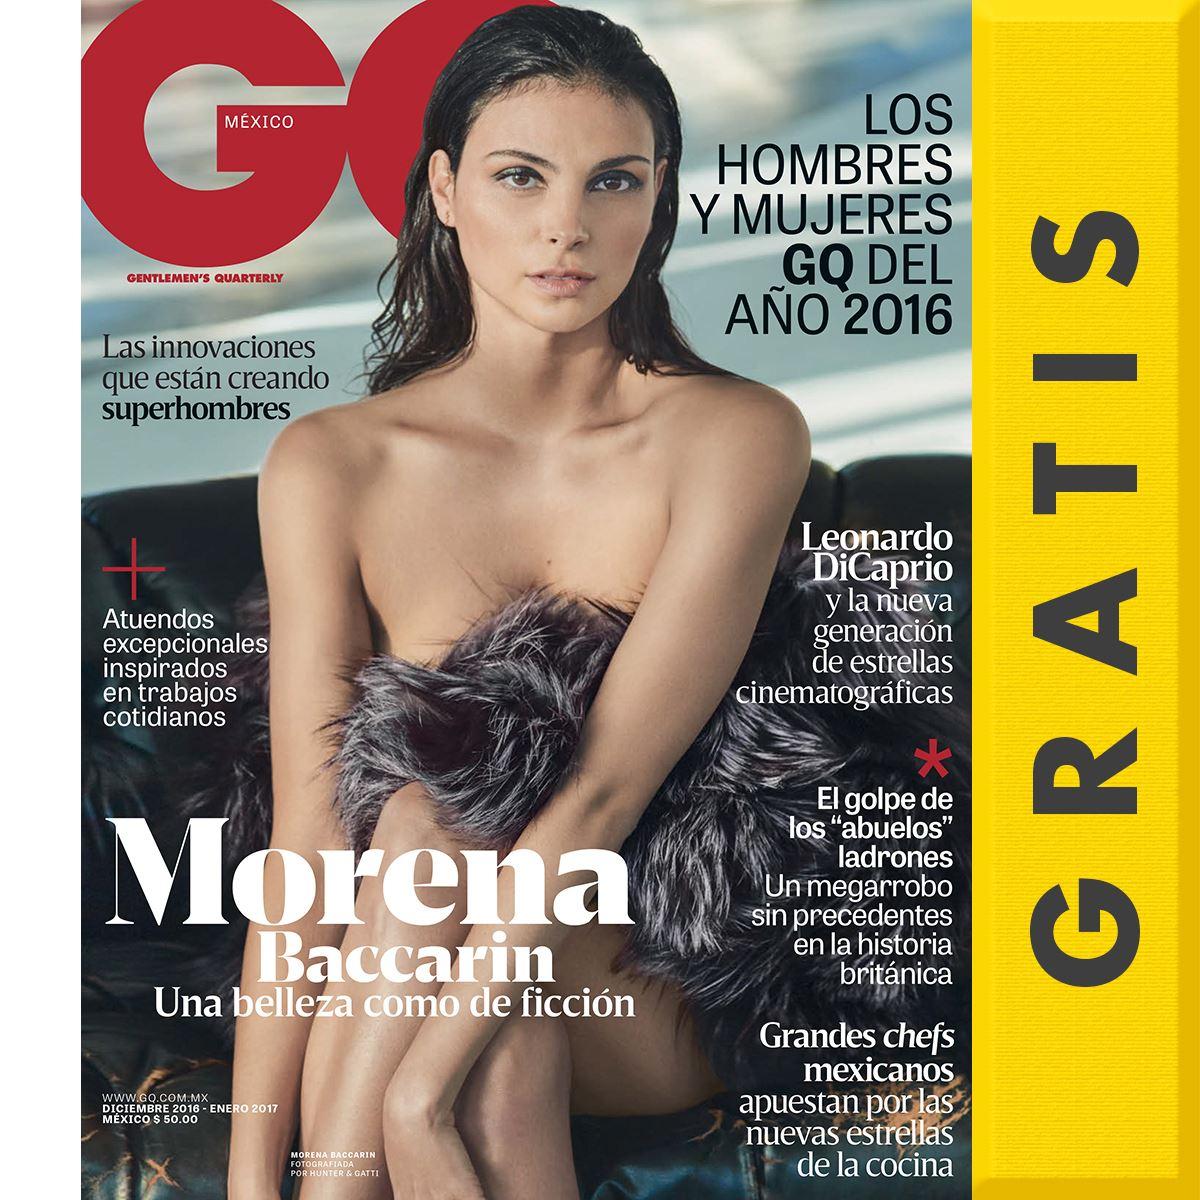 Sanborns: Revistas Digitales Gratis Diciembre 2016